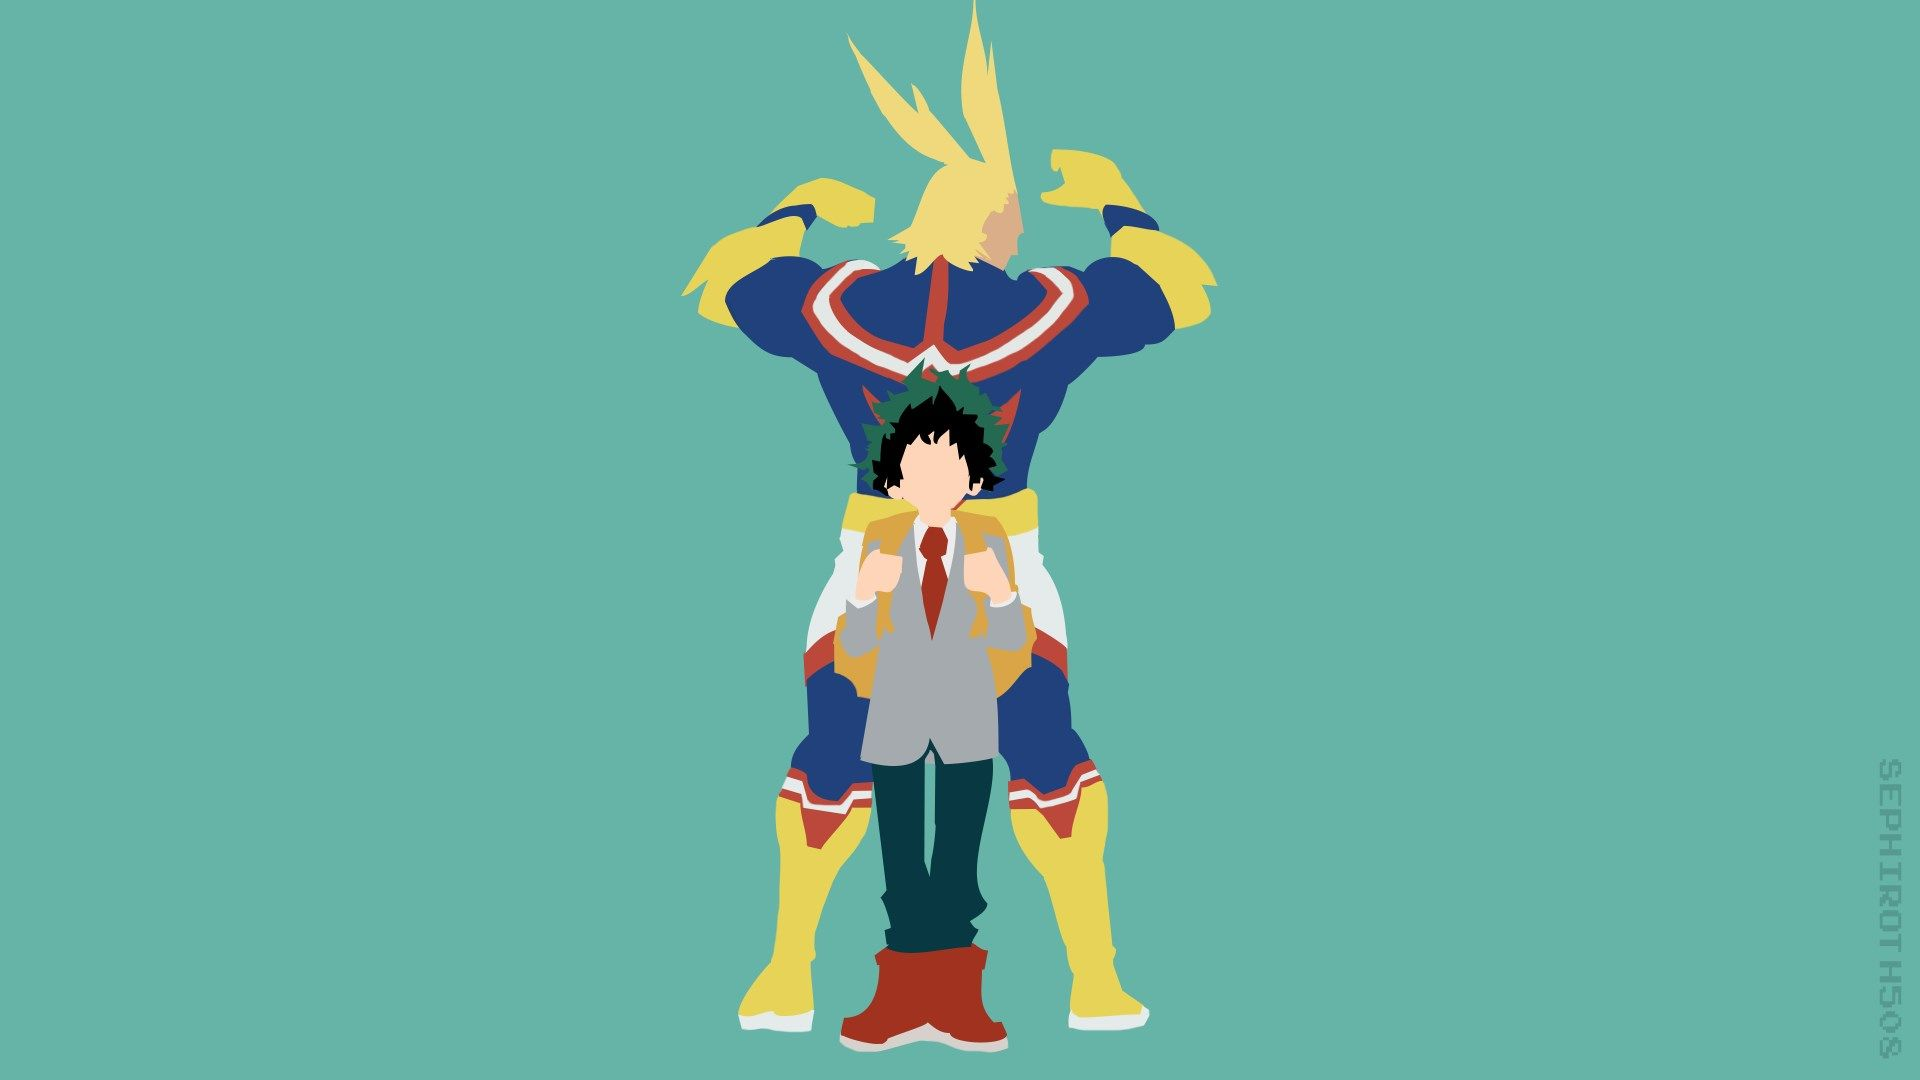 2017 03 09 Boku No Hero Academia Wallpaper Full Hd Backgrounds